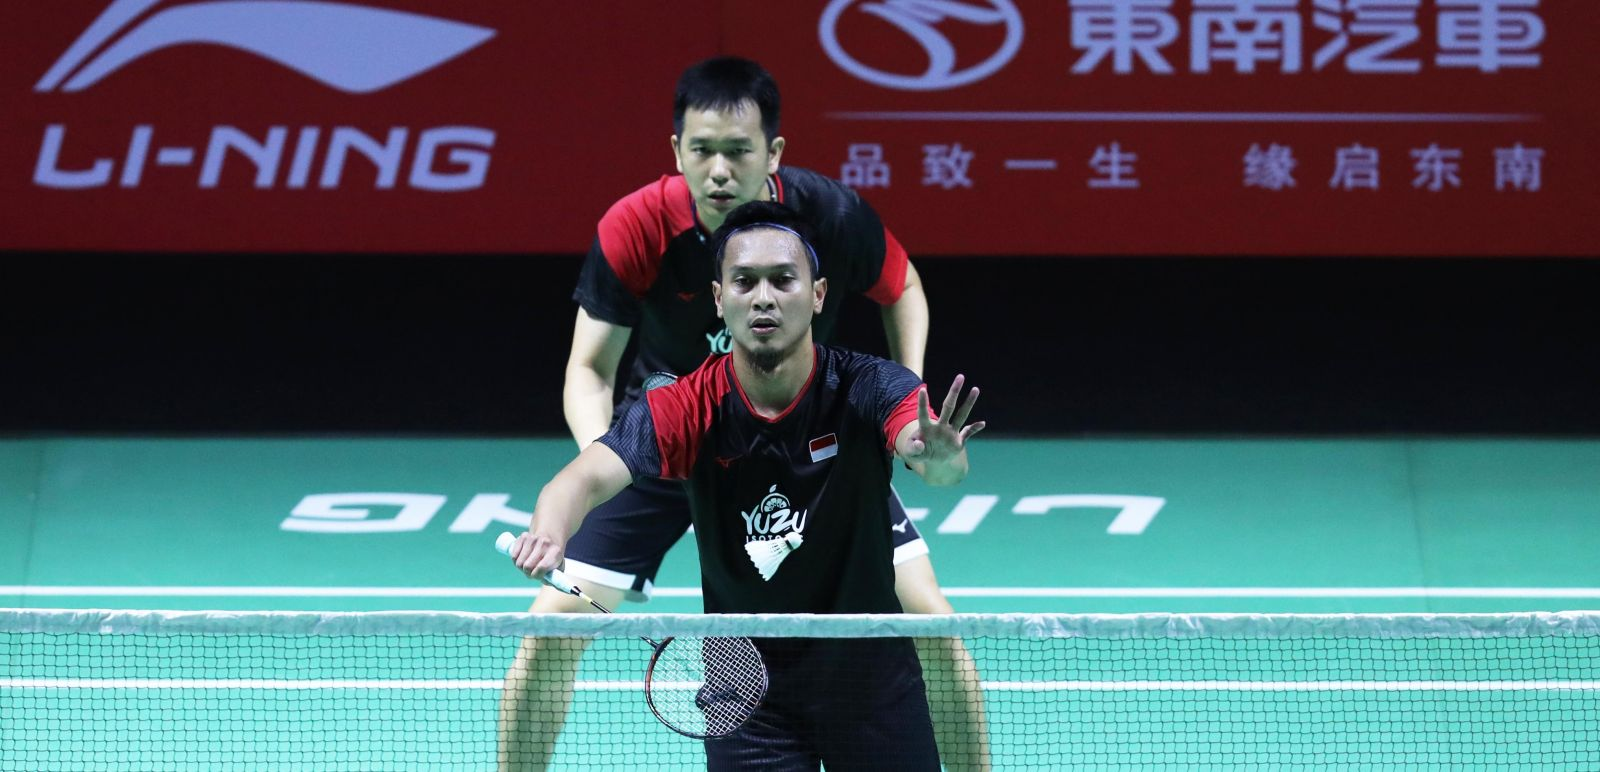 Ganda putra Indonesia Mohammad Ahsan/Hendra Setiawan harus bersusah payah merebut tiket perempat final Fuzhou China Open 2019. Foto: PBSI